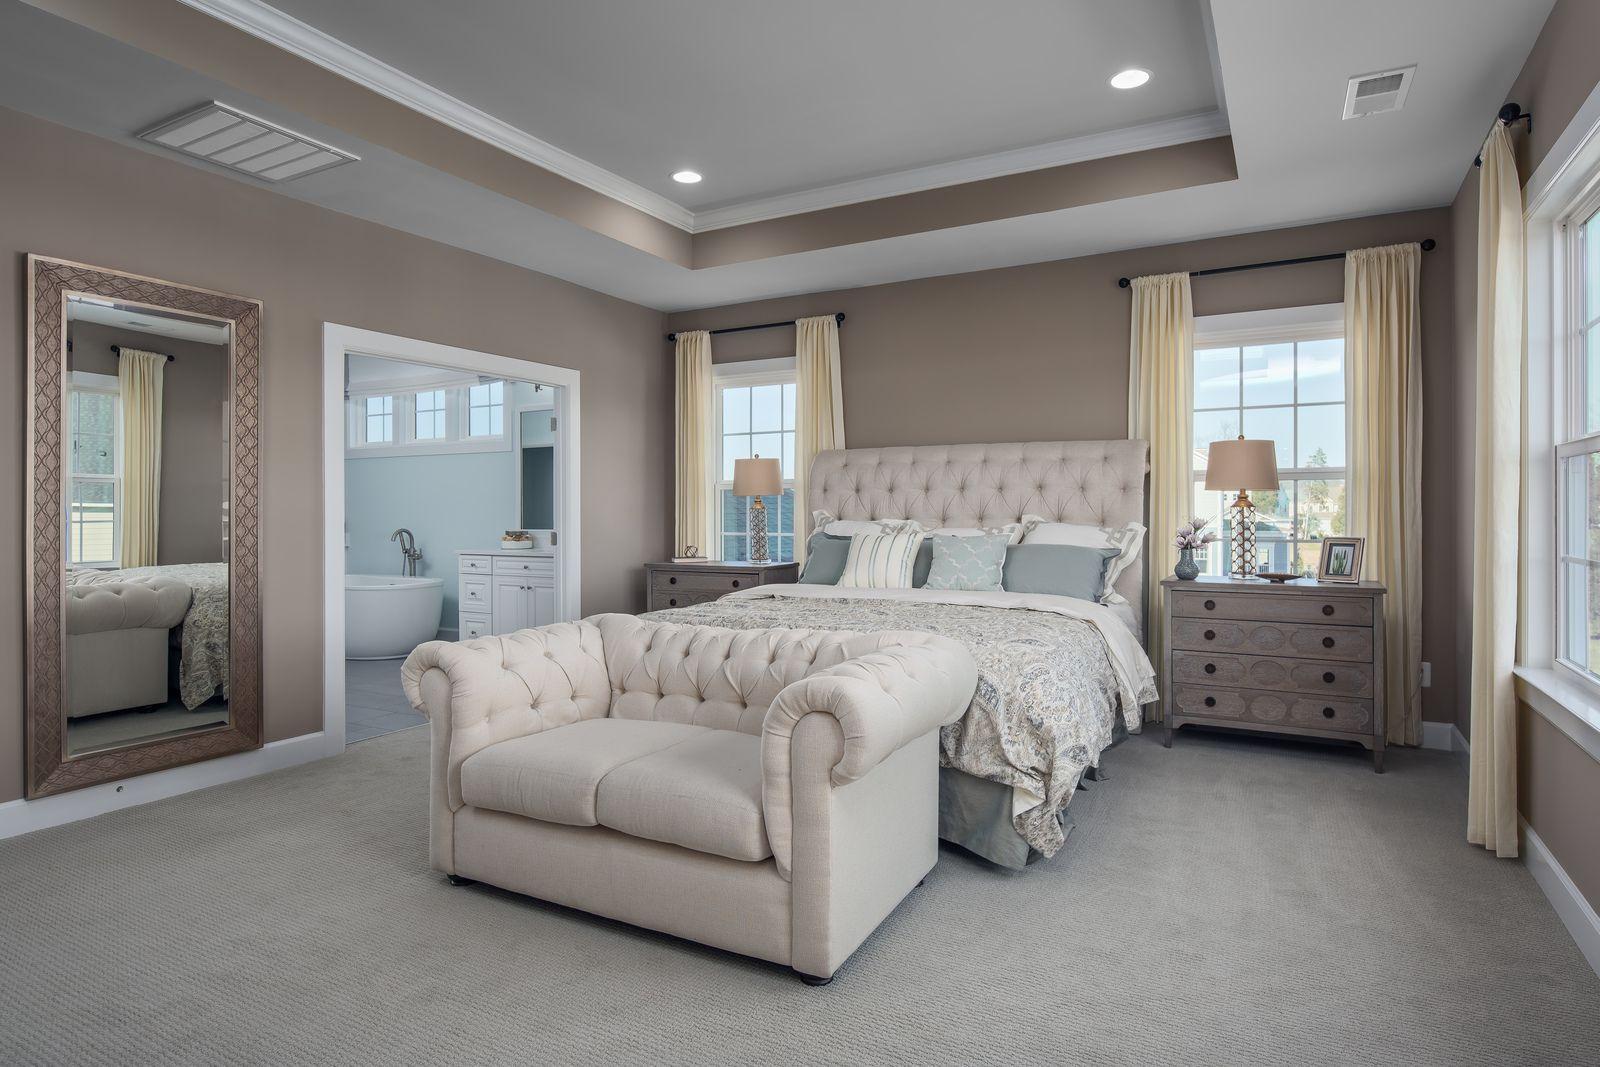 Bedroom featured in the Radford By HeartlandHomes in Morgantown, WV